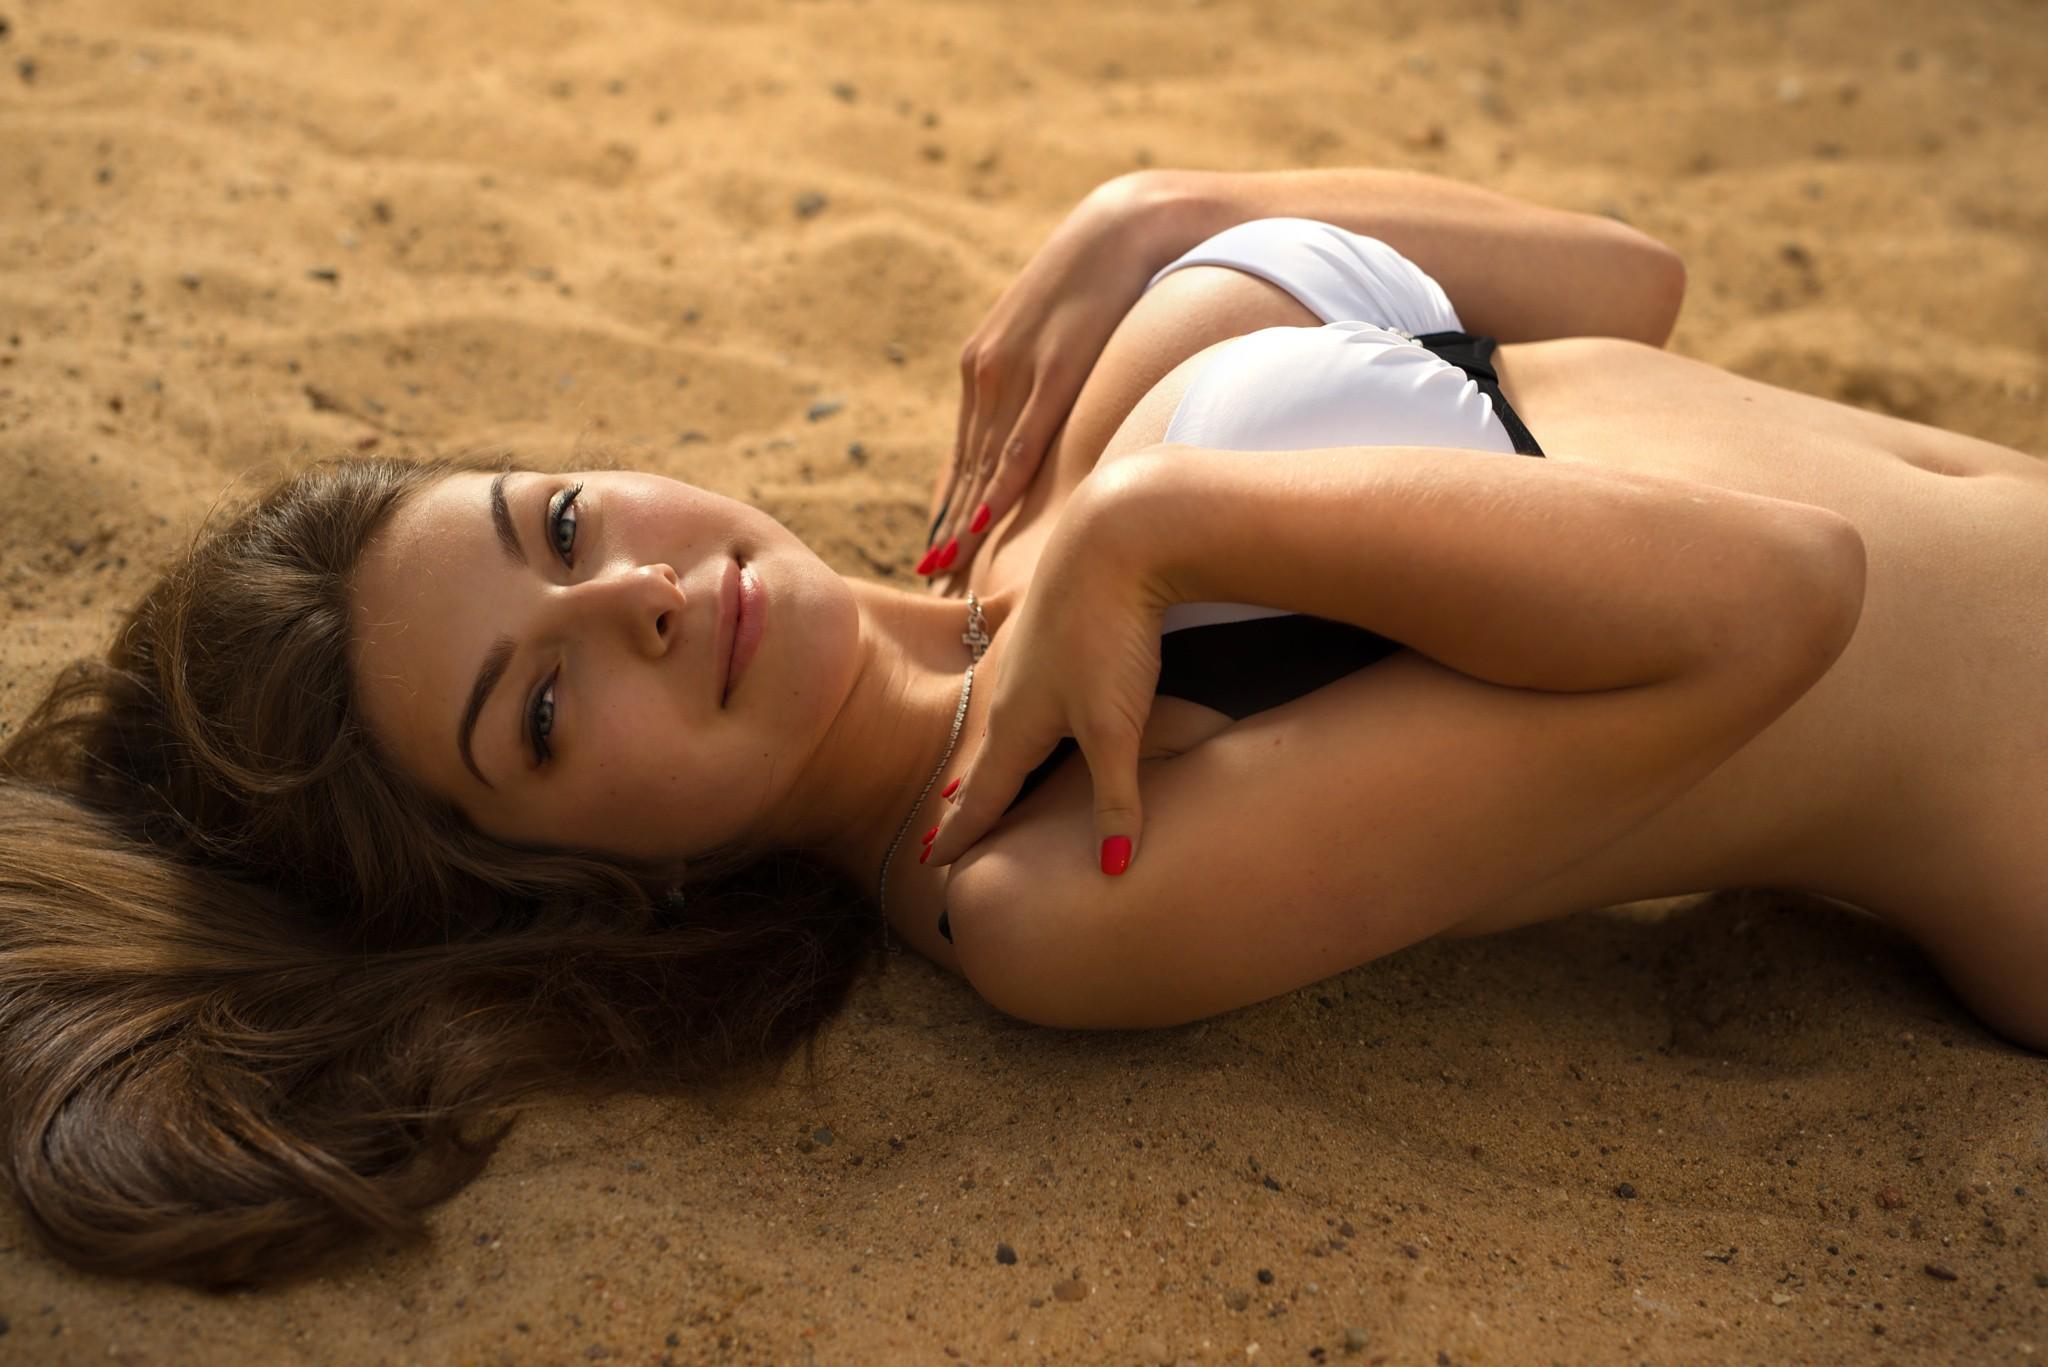 Sexy topless woman posing beach sand stock photo